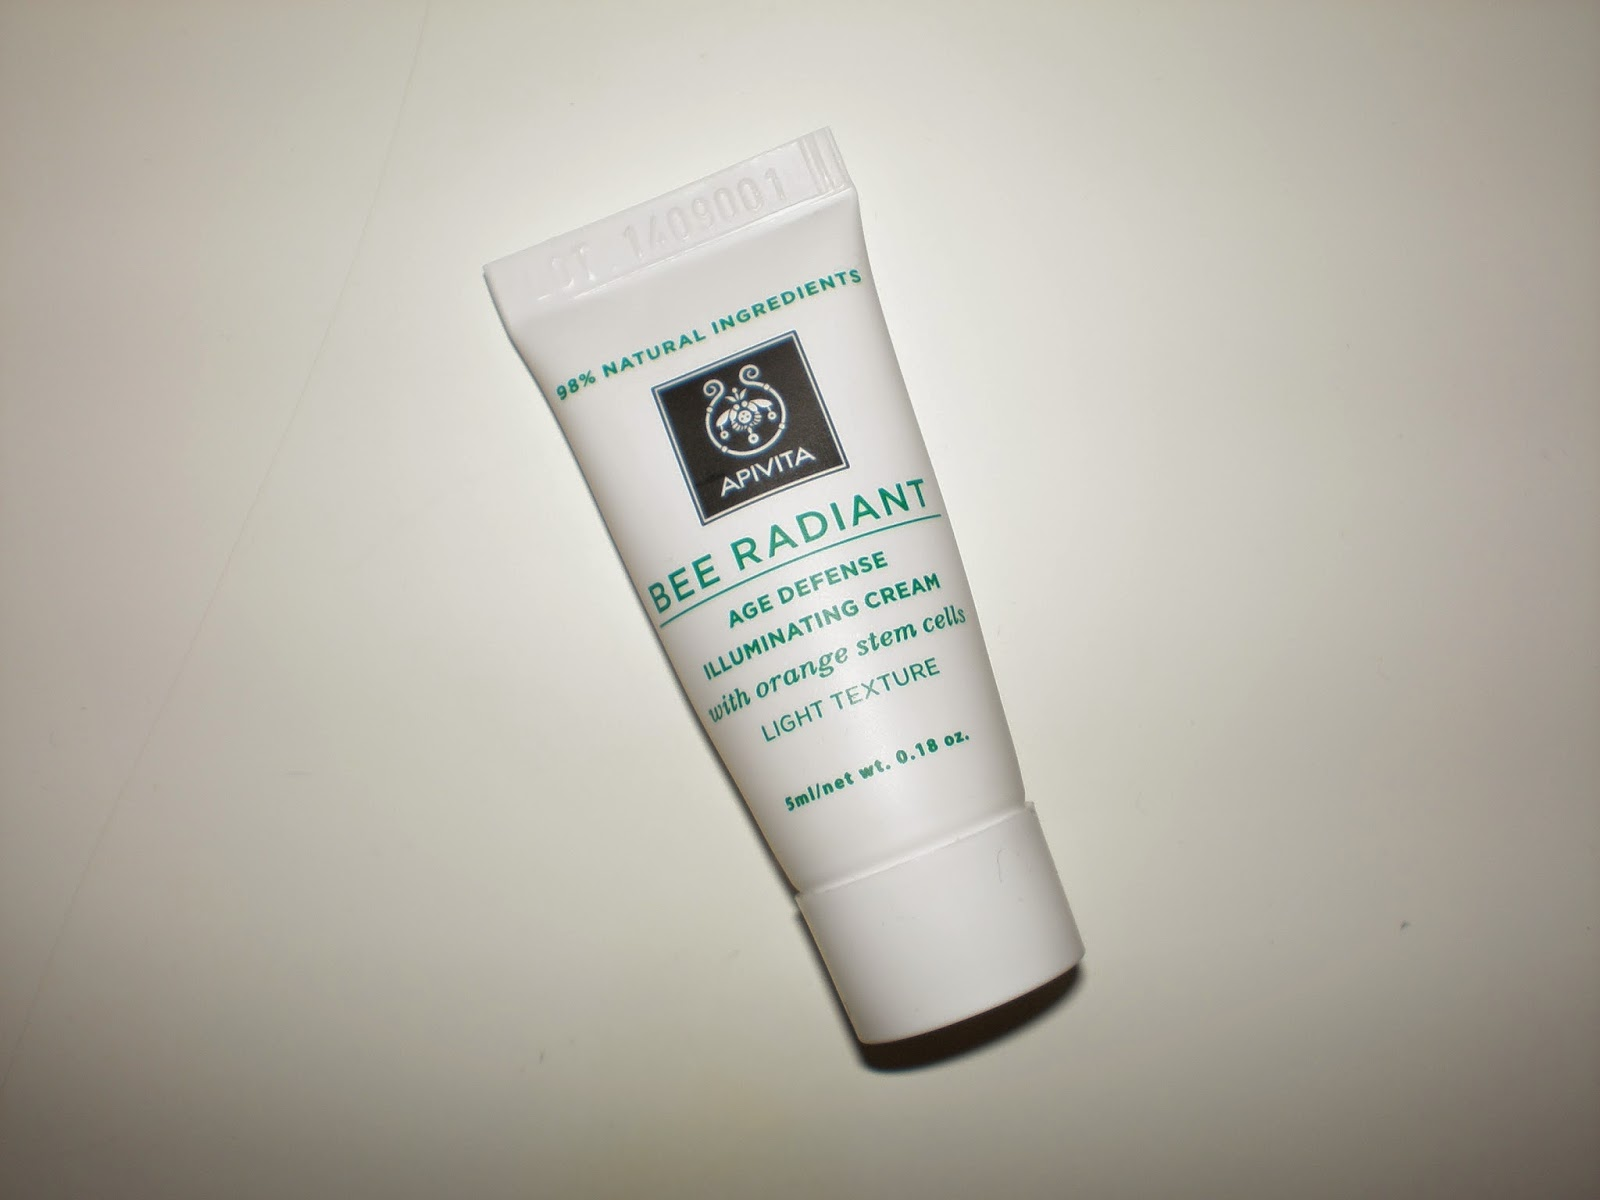 Apivita Bee Radiant Age Defence Illuminating cream